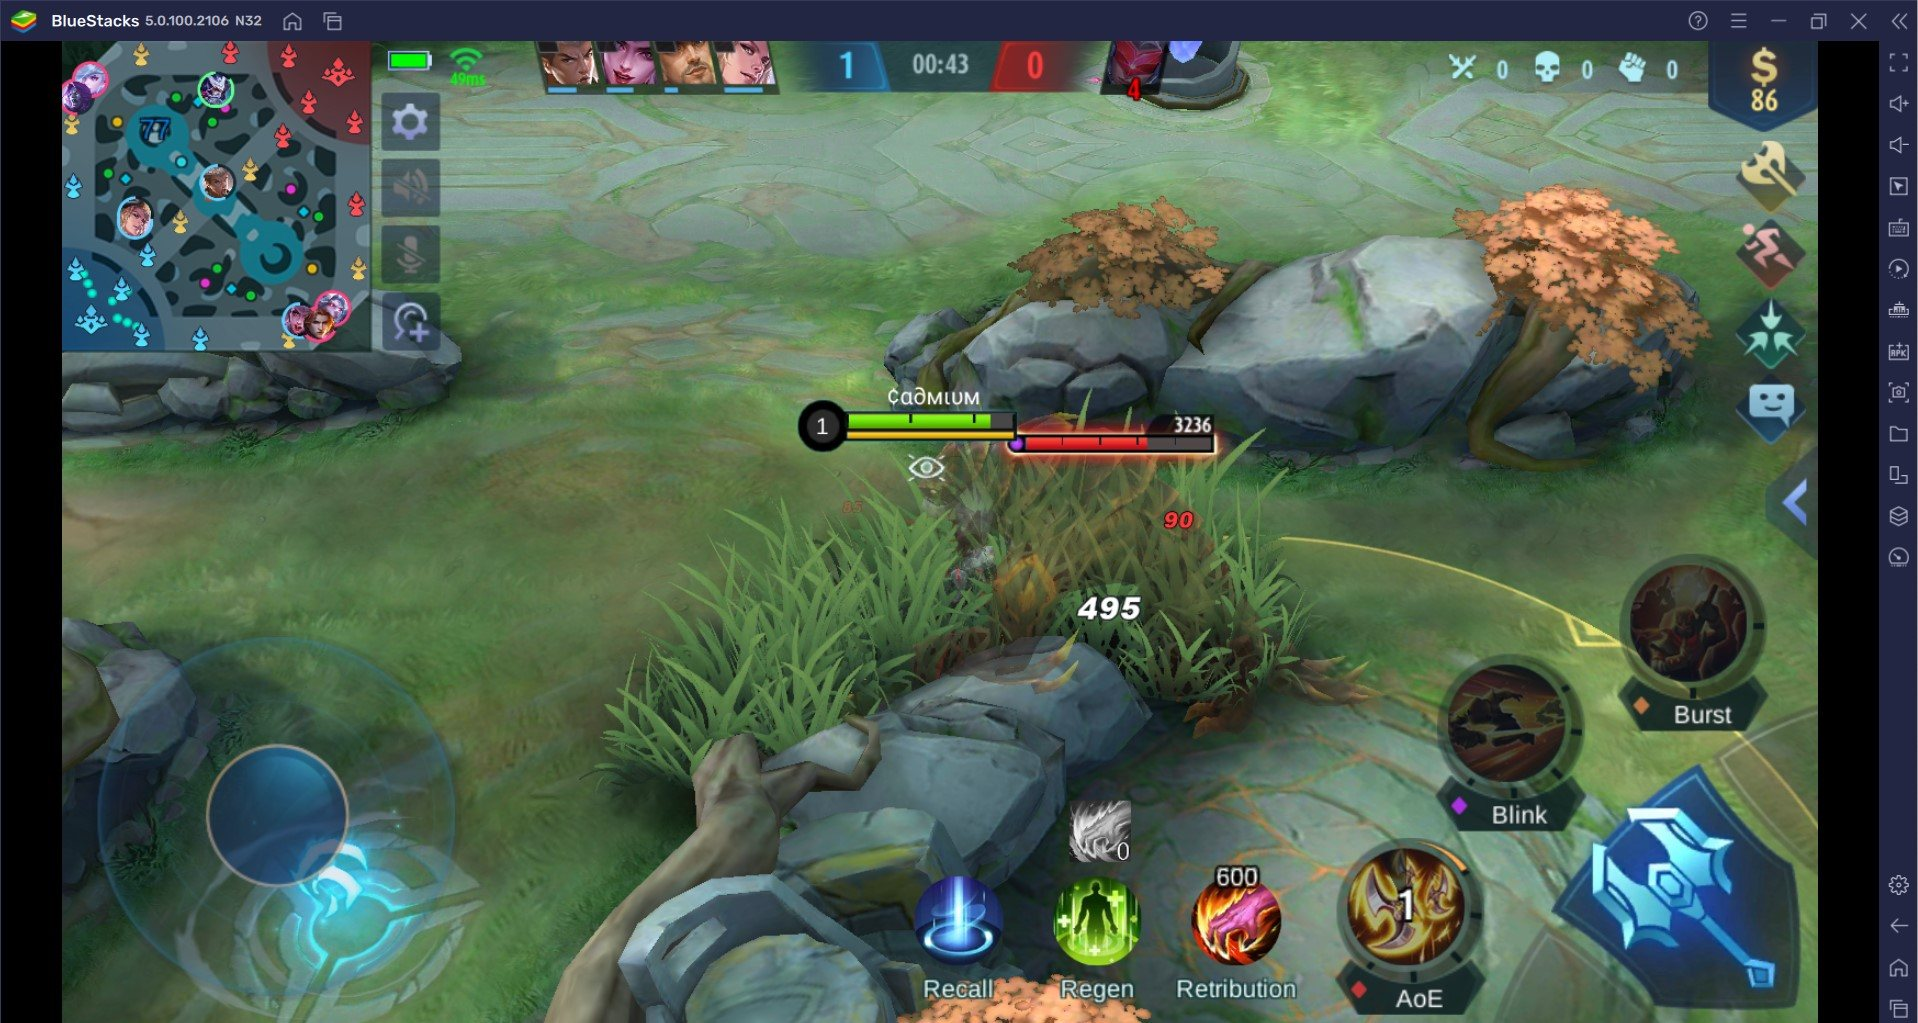 BlueStacks' Mobile Legends: Bang Bang Hero Guide for Hayabusa